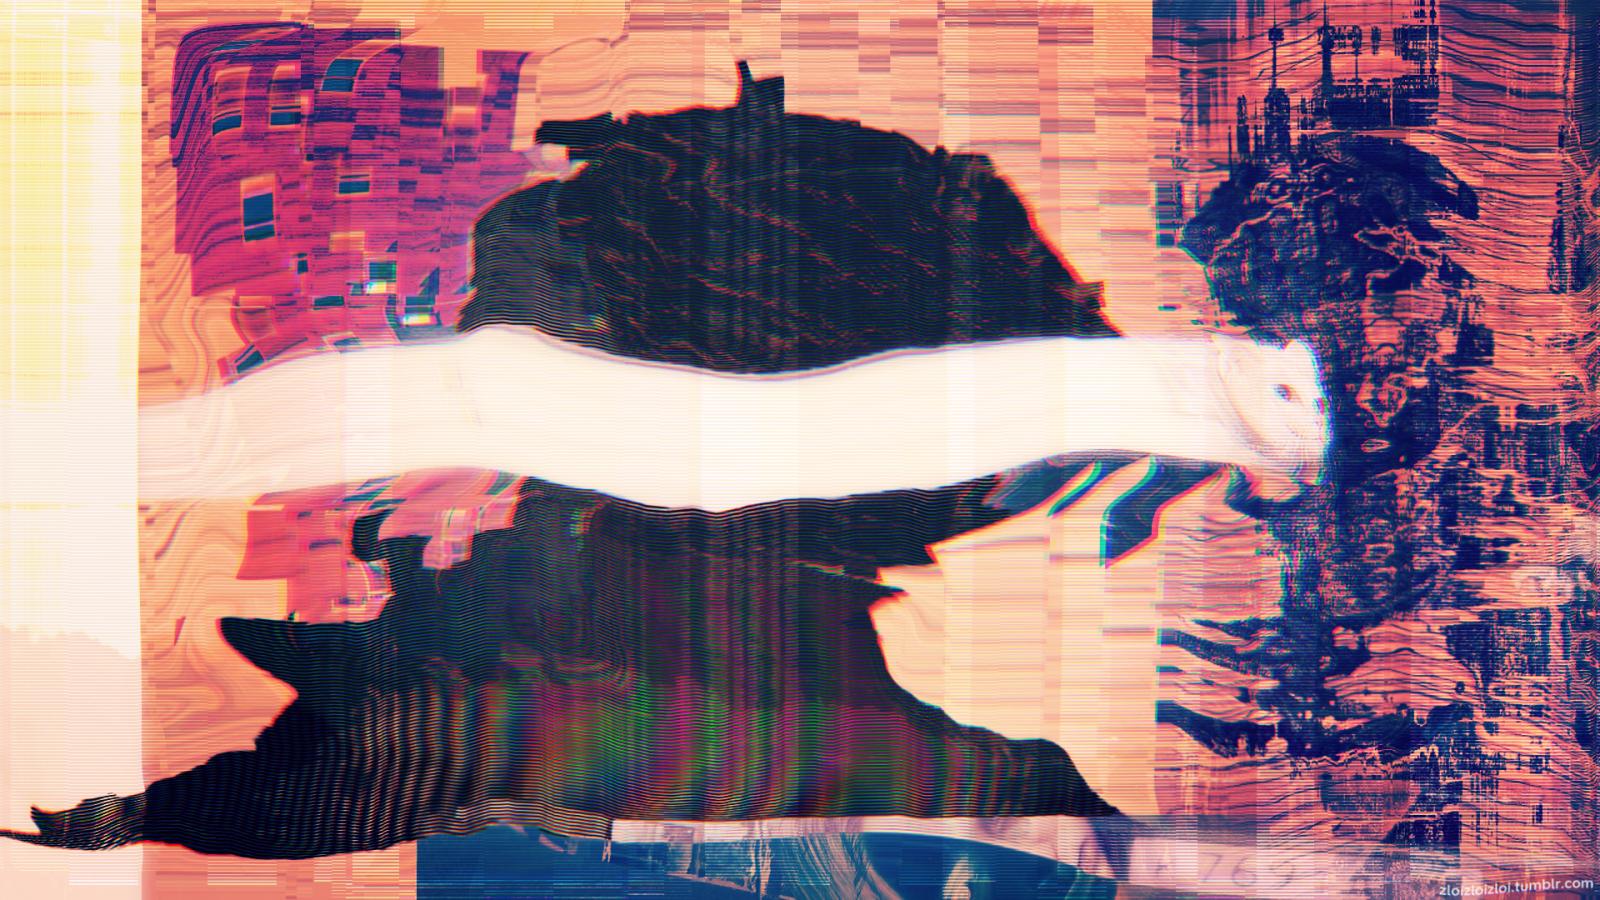 76+ Gambar Abstrak Narkoba Paling Bagus